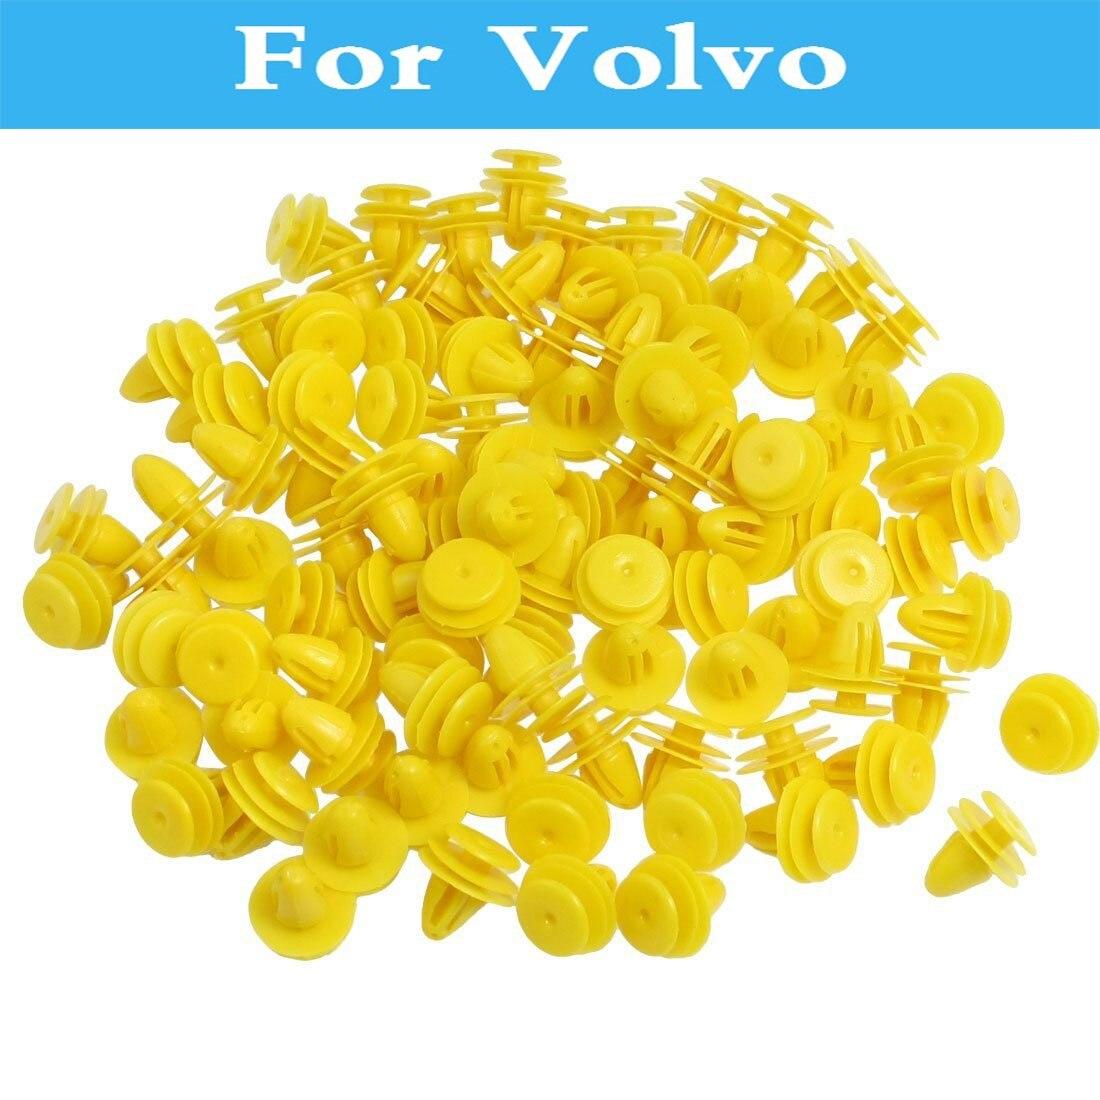 50 stücke Gelb Kunststoff Niet Auto Tür Trim Panel Clips Für Volvo S40 S60 S80 Xc90 C30 C70 V40 V50 v60 Kreuz Land V70 Xc60 Xc70